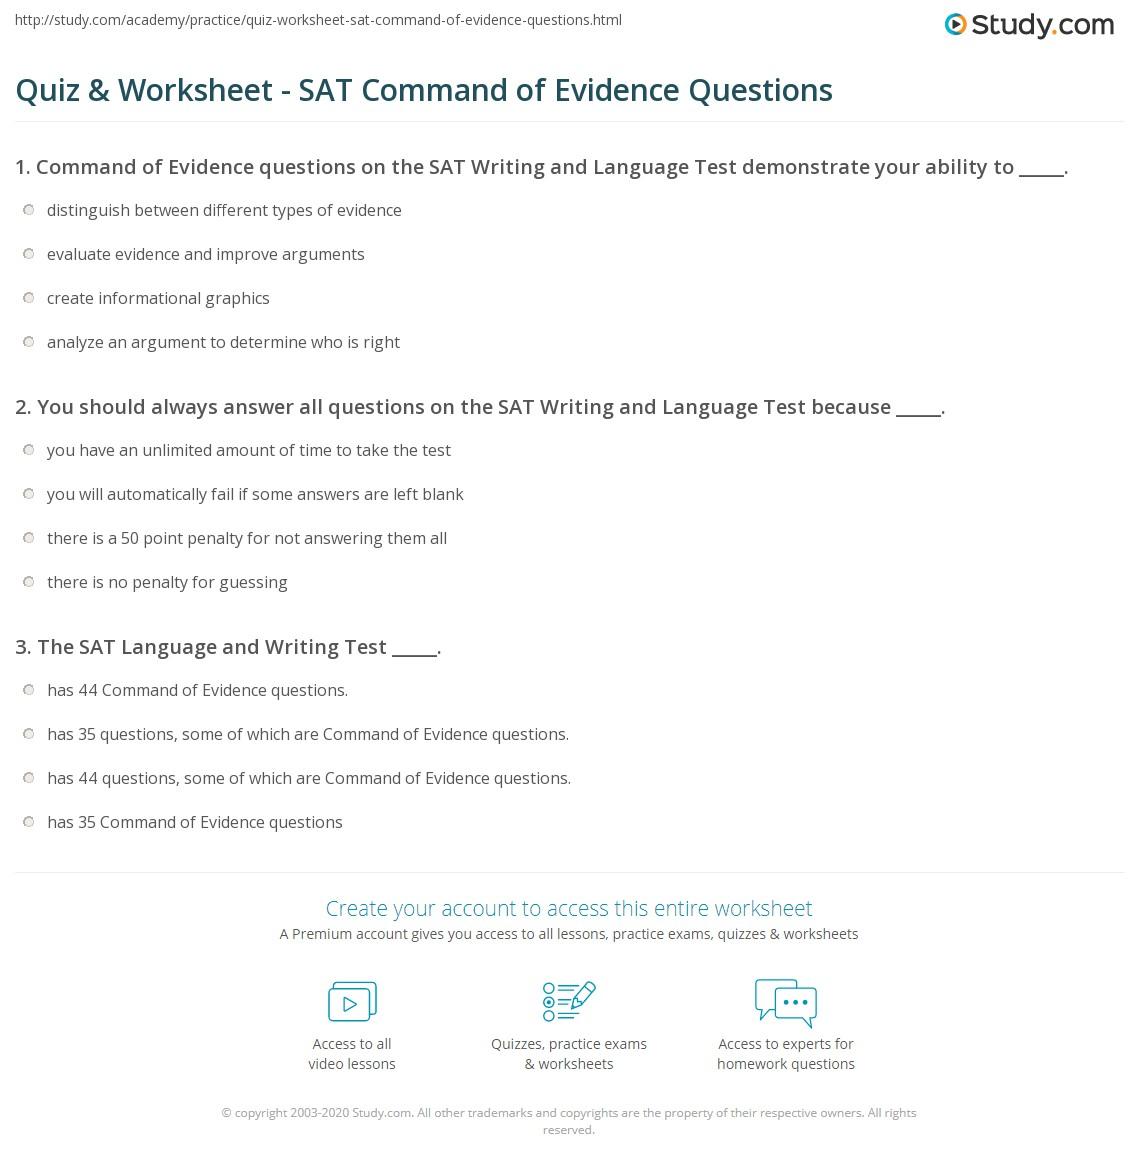 Worksheets Sat Grammar Worksheets quiz worksheet sat command of evidence questions study com print writing language test worksheet